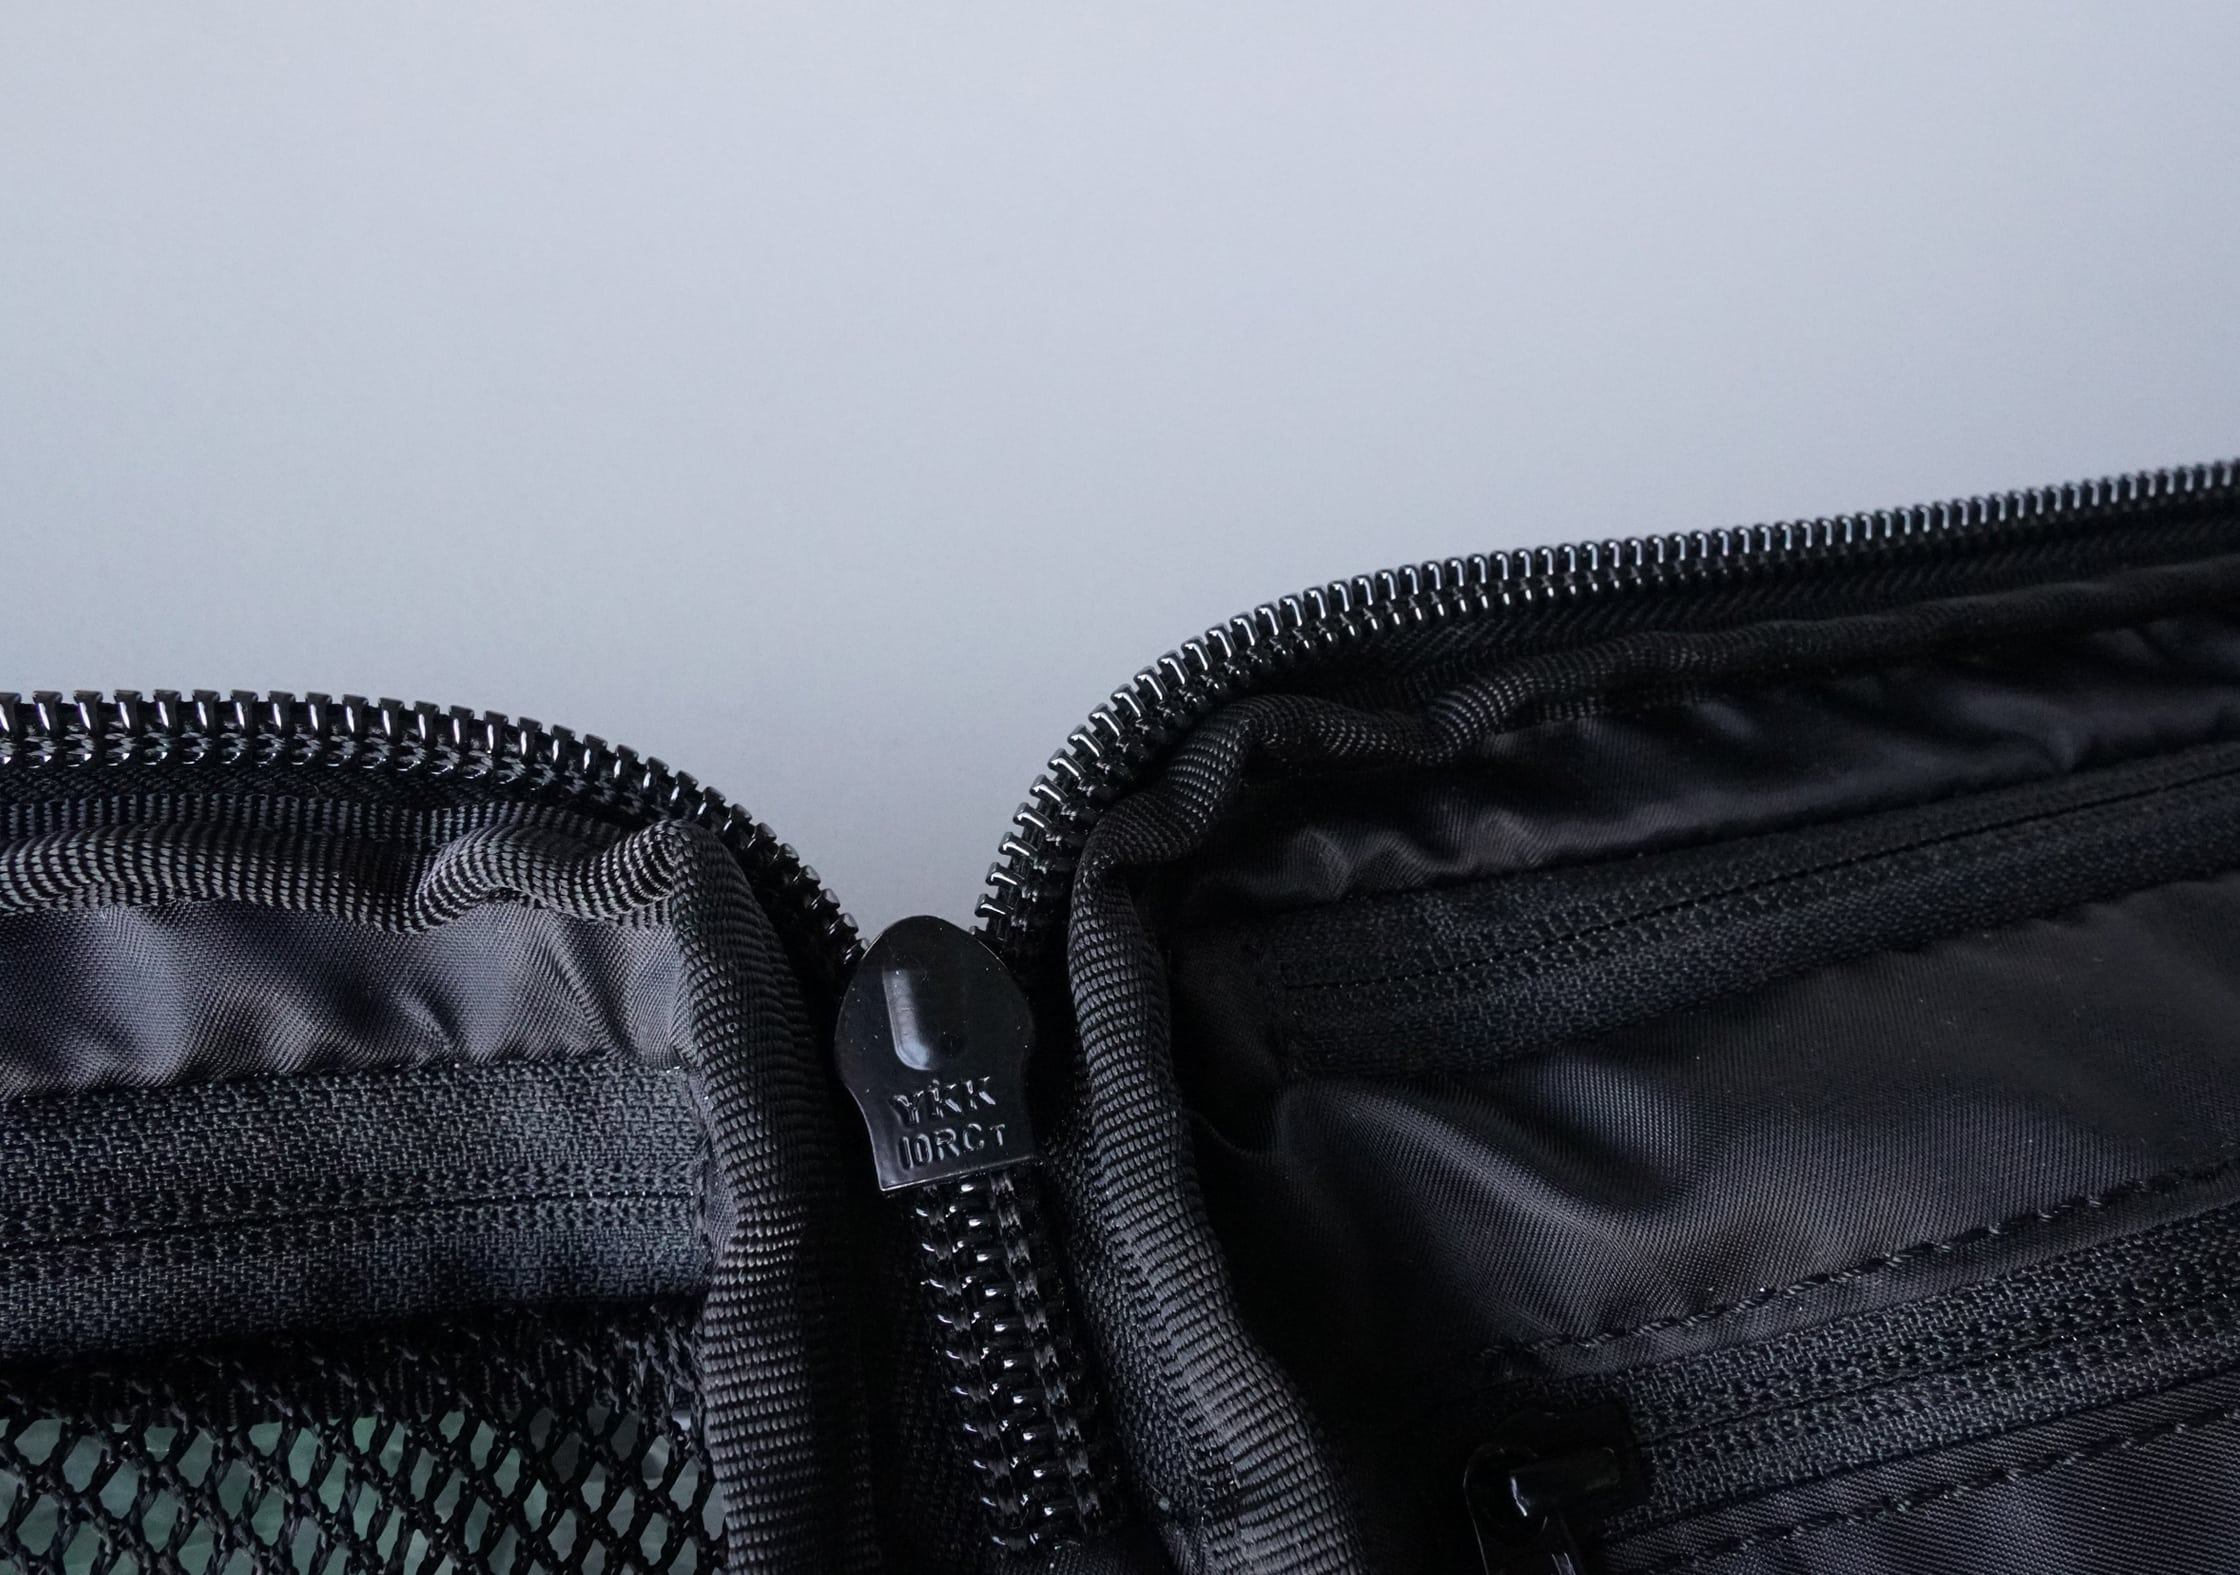 Chrome Macheto Travel Backpack YKK #10 RC